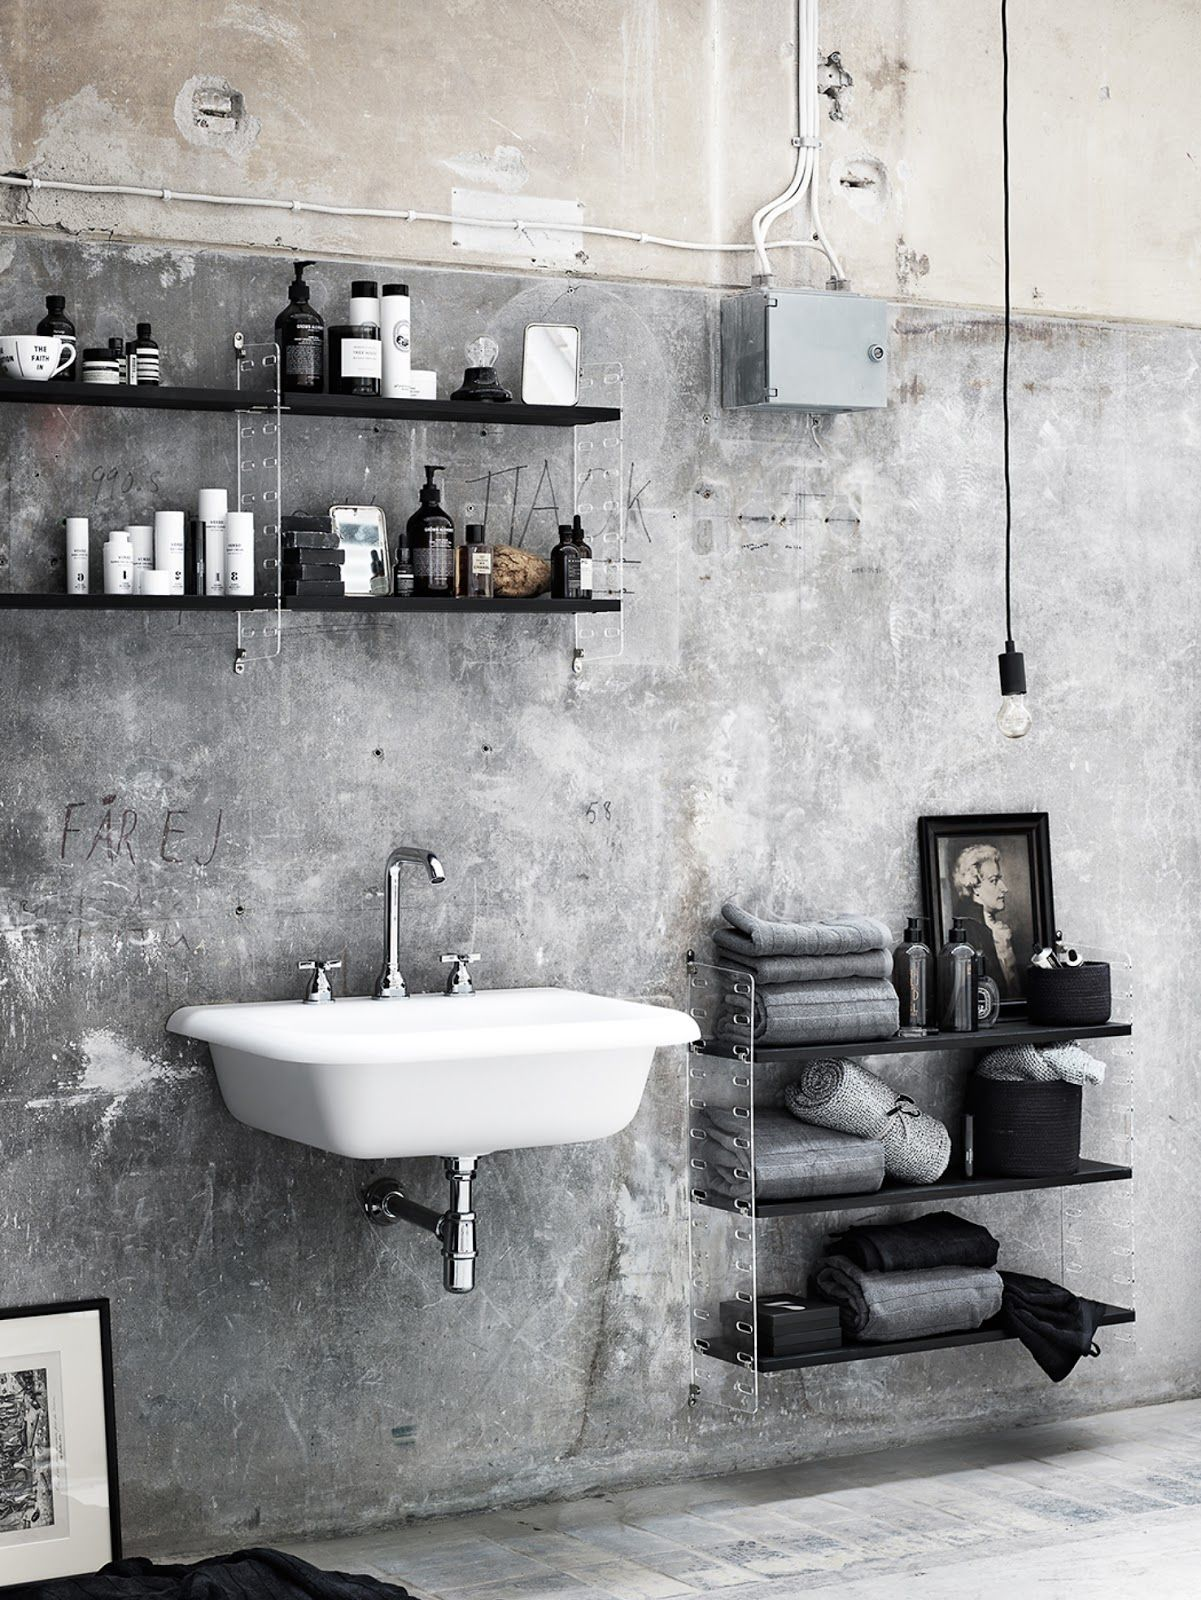 Raw industrial bathroom   Bathroom   Pinterest   Industrial ...